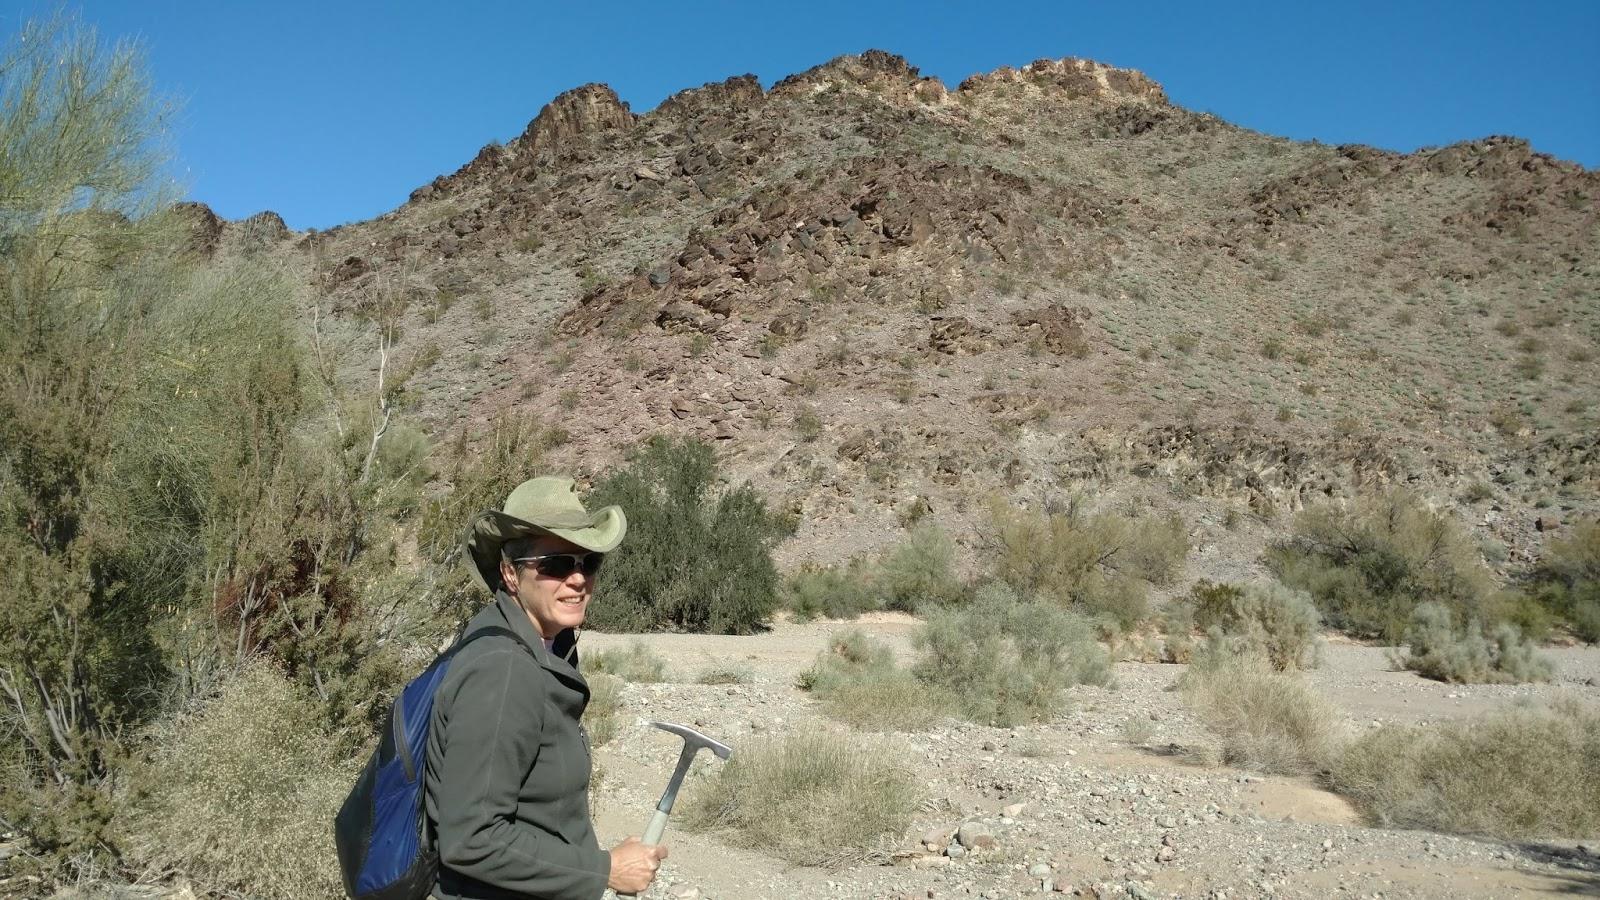 Dave'n'Kathy's Vagabond Blog: Rockhounding at Crystal Hill